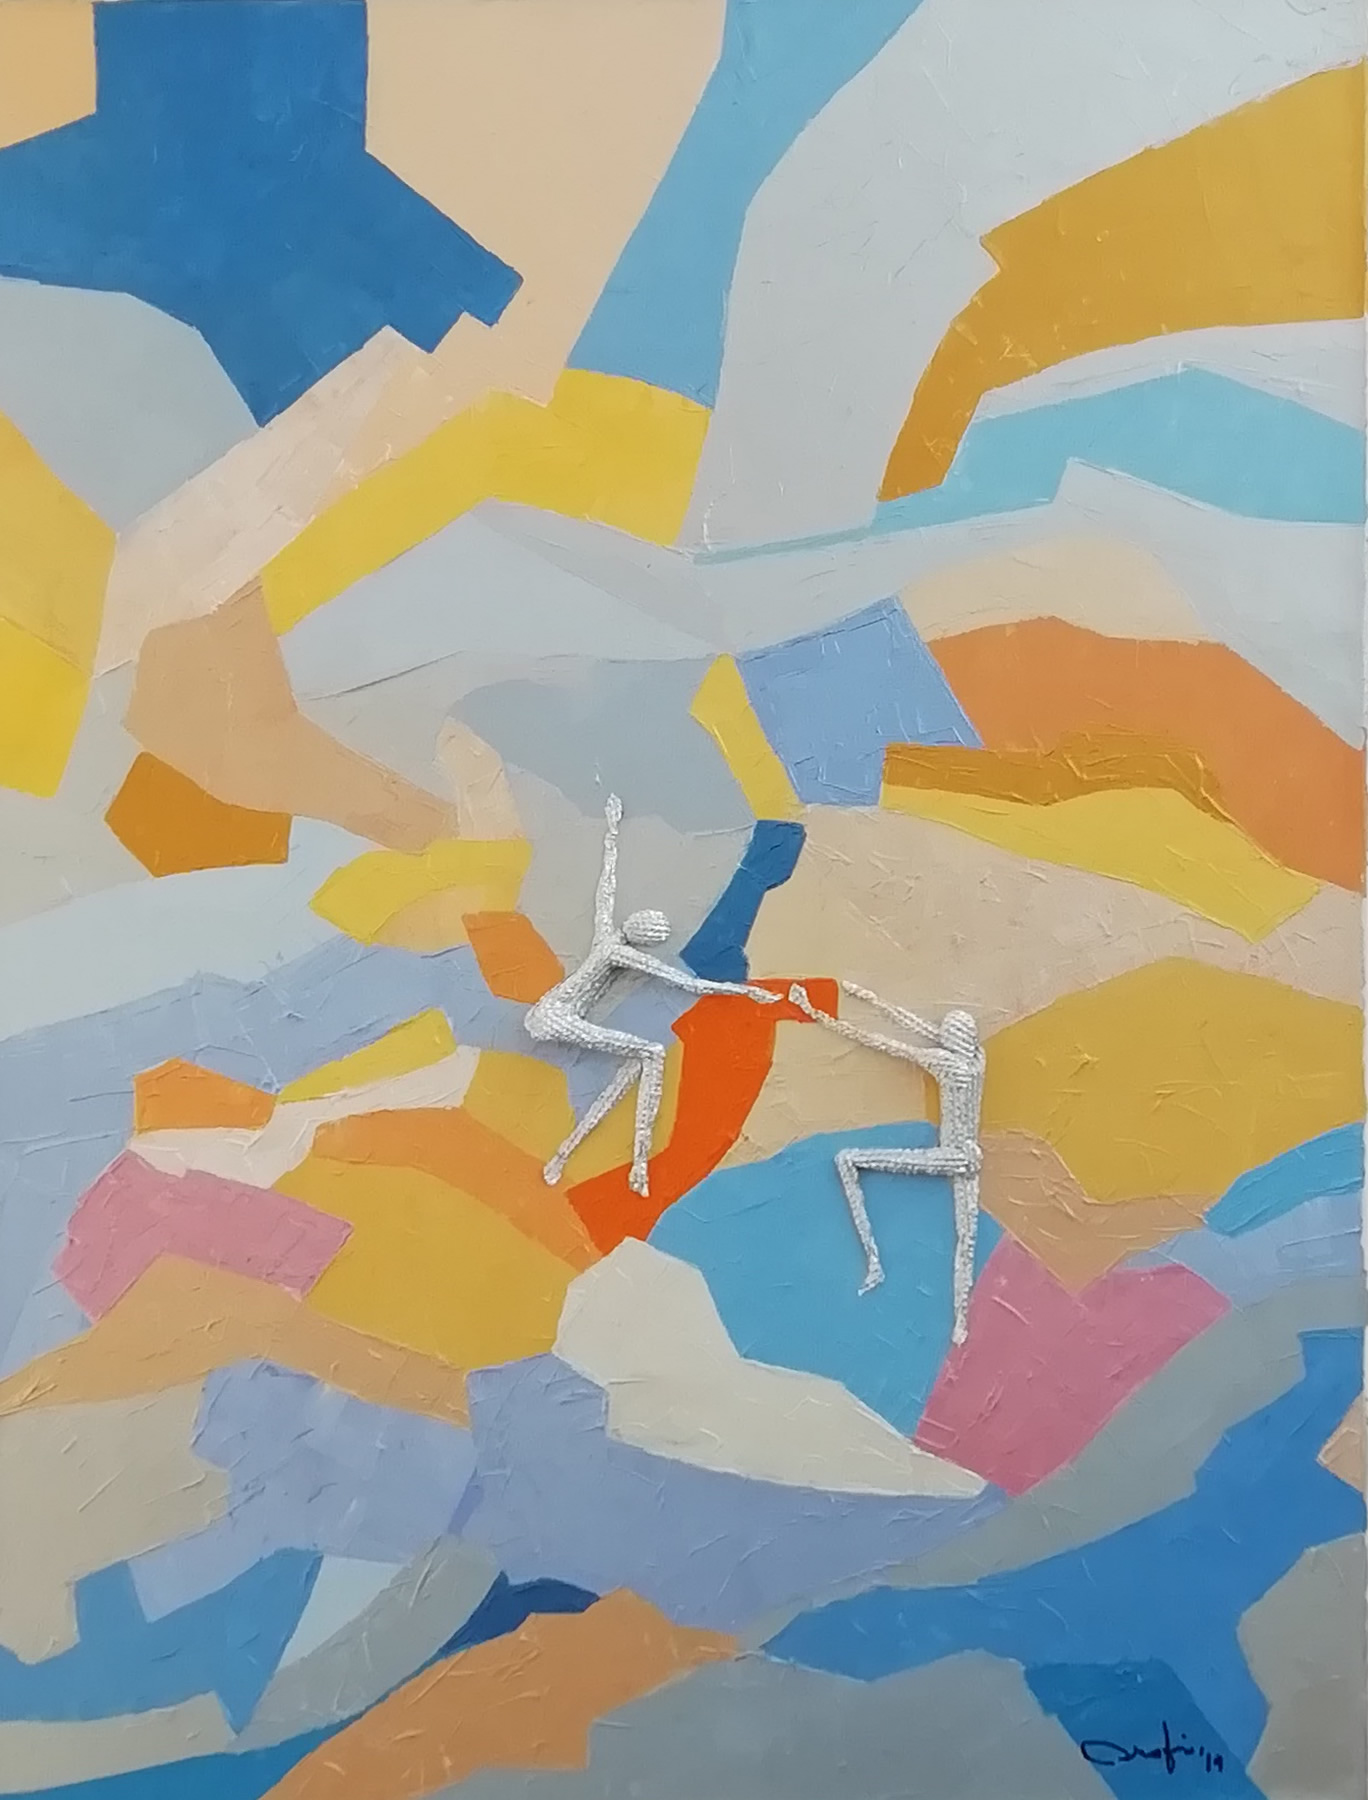 Maria Rita Onofri - Inside the Dream